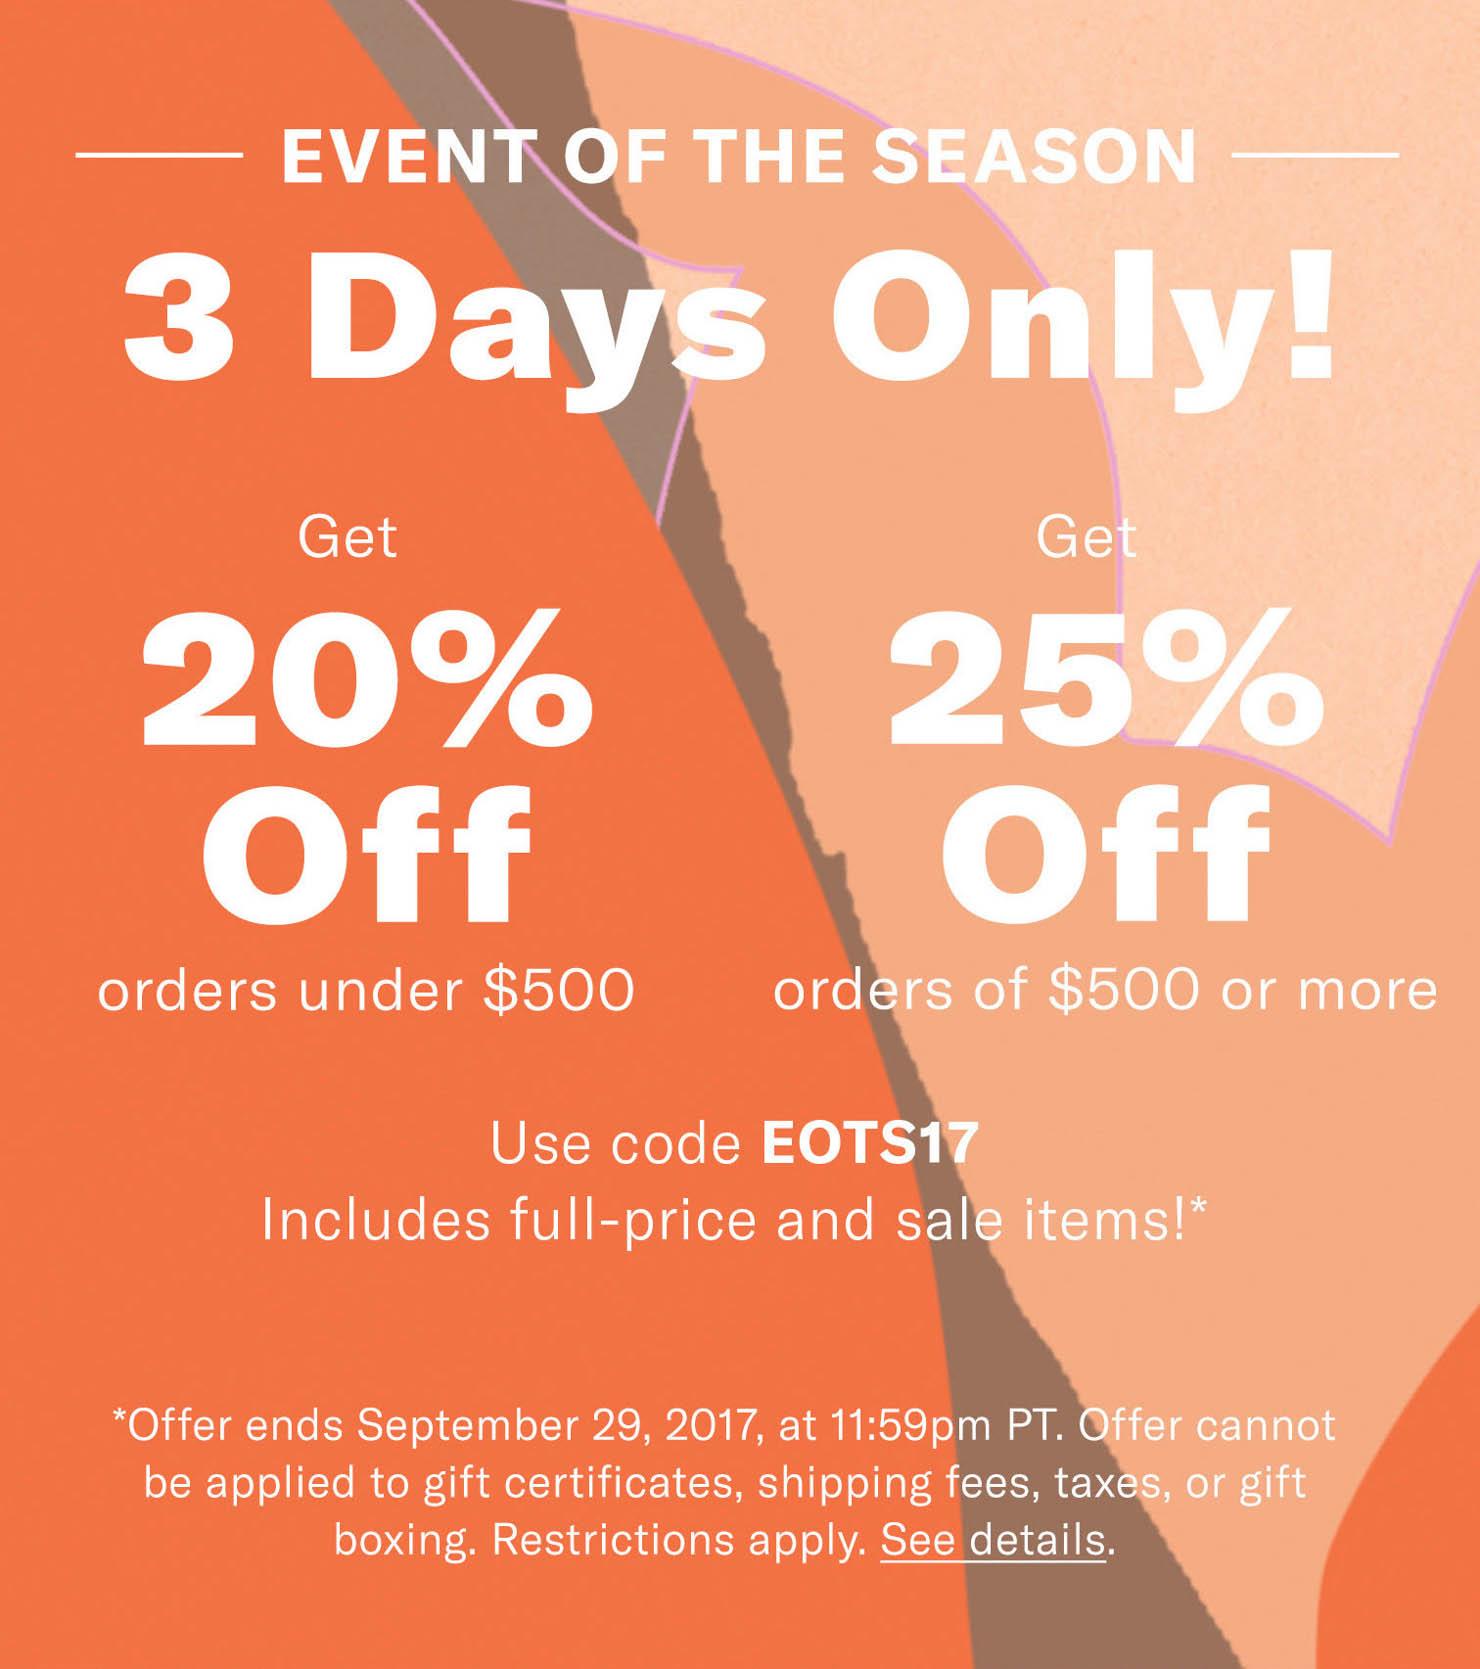 Shopbop fall sale 2017, fall trends 2017, fall wardrobe essentials, fall stock up